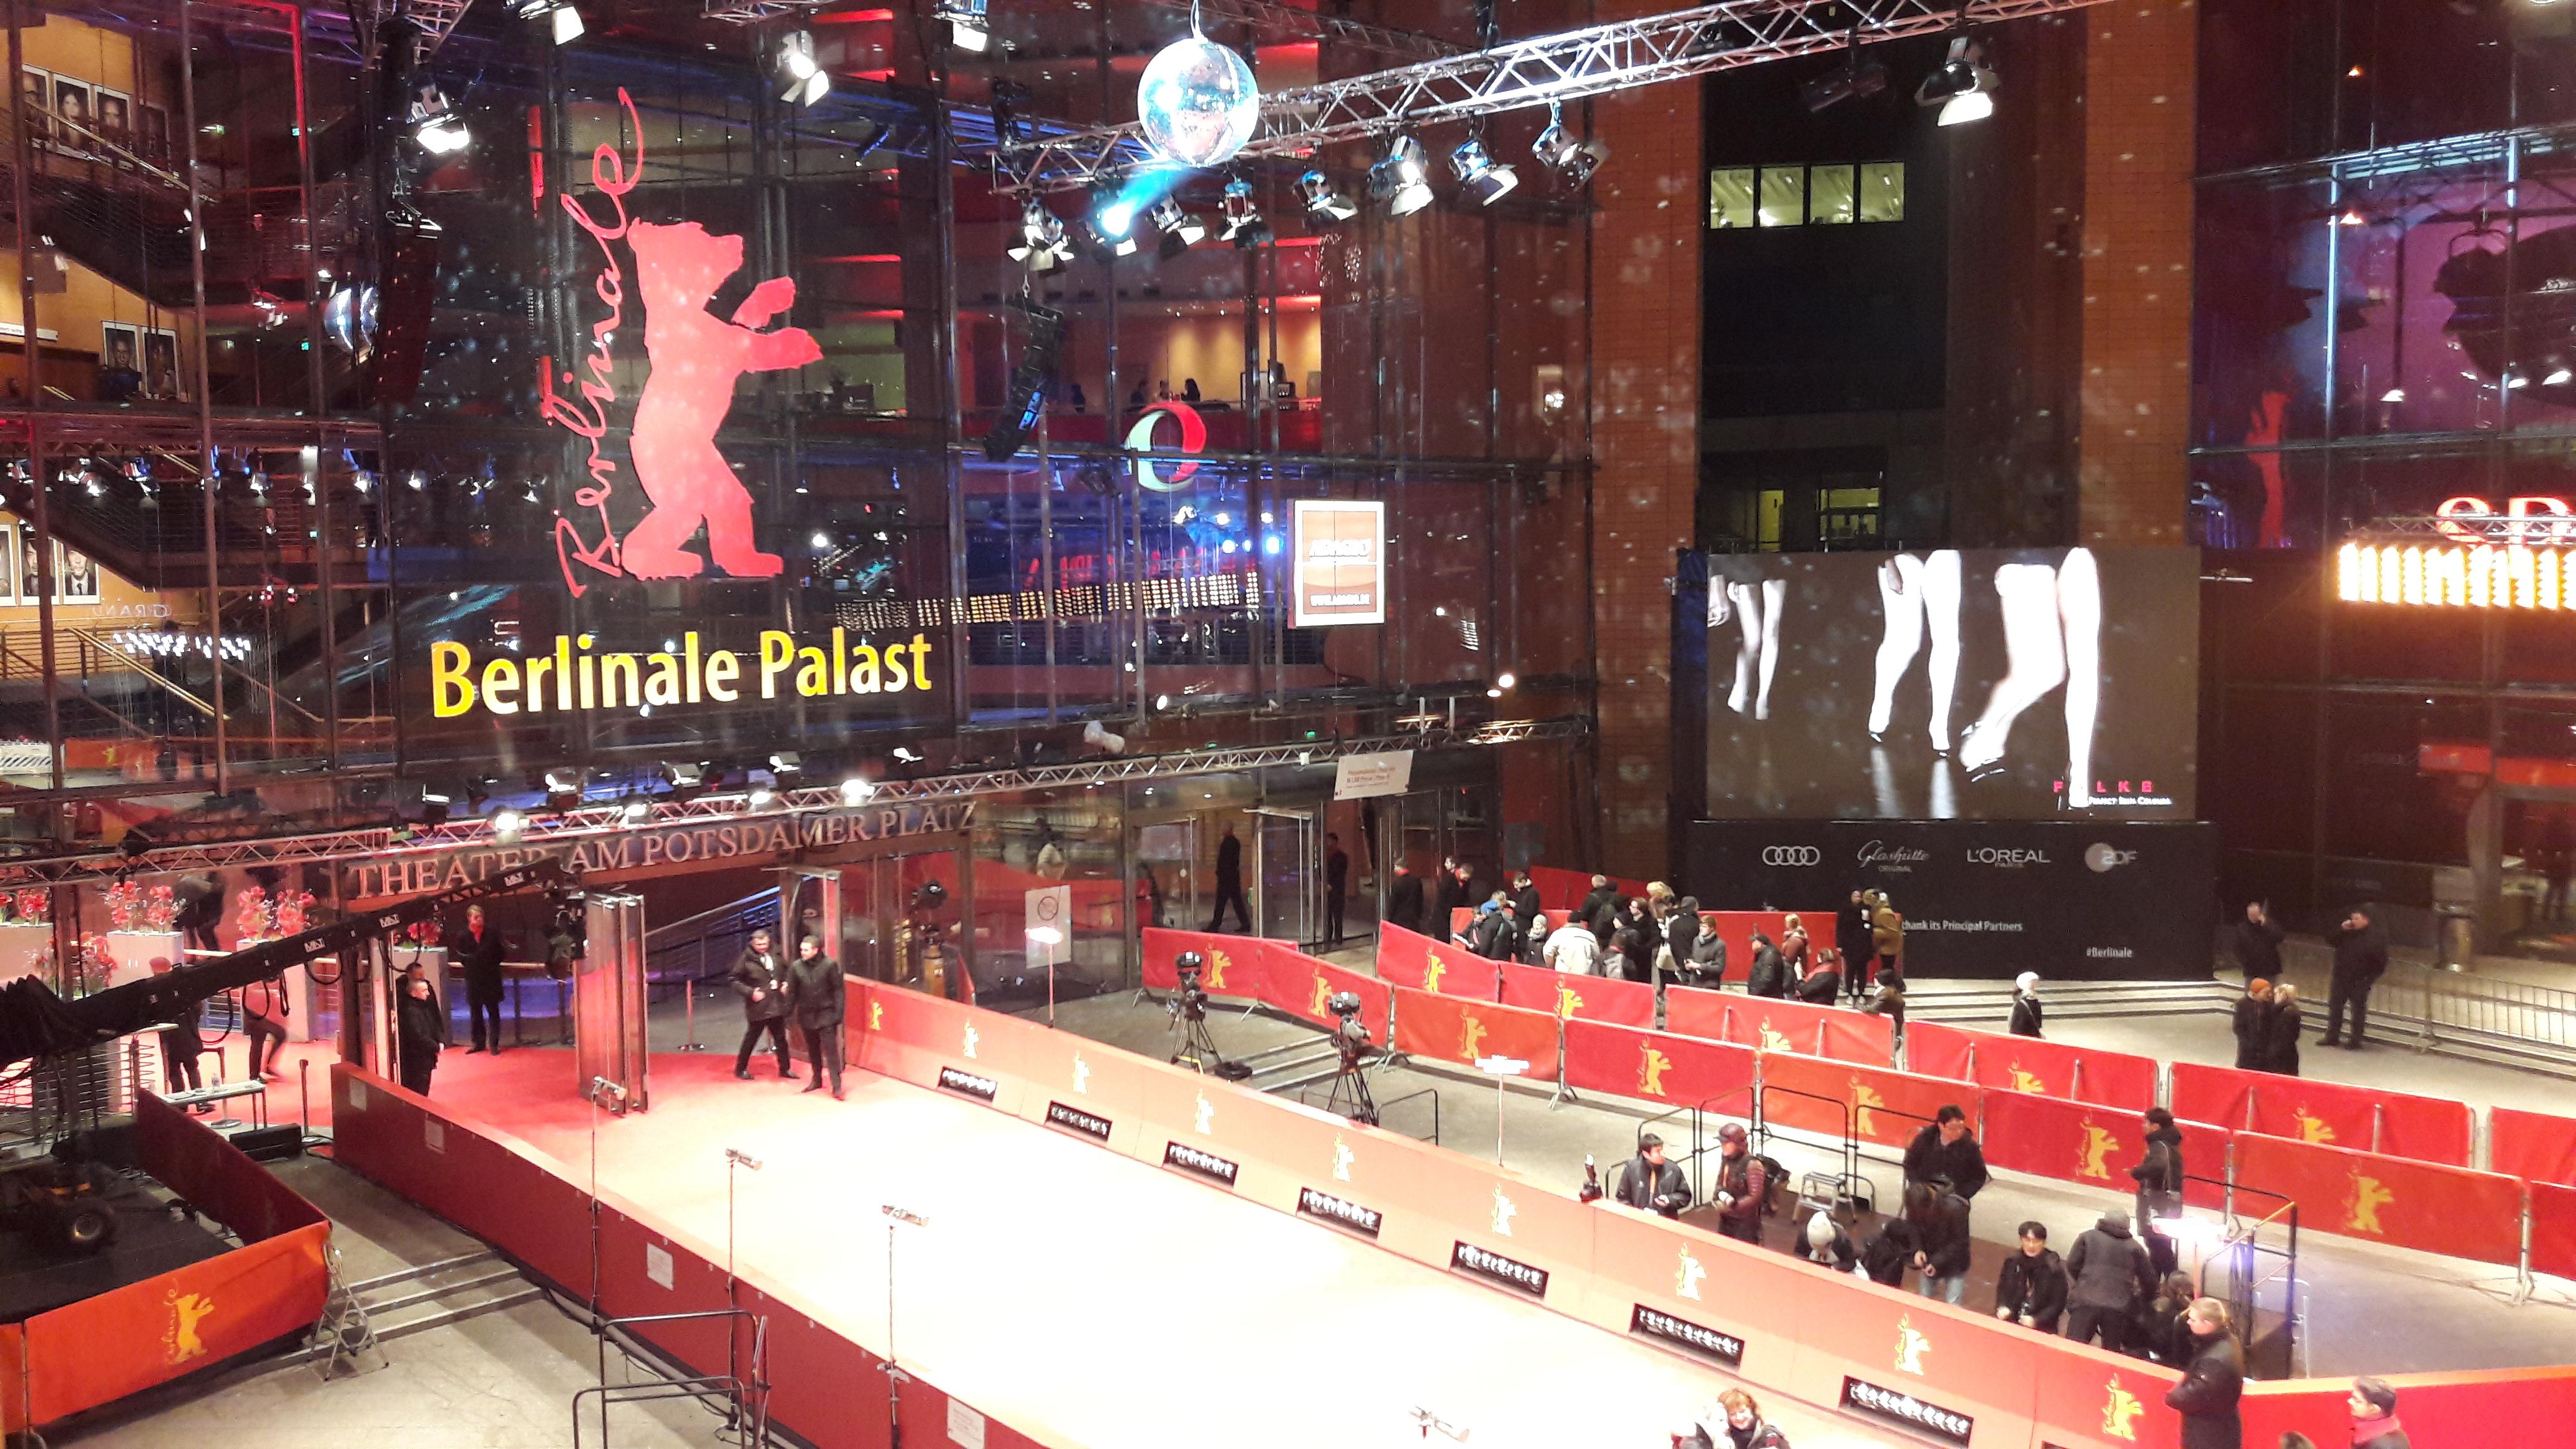 Berlinale Palast  Bild: Franziska Venjakob / bonnFM